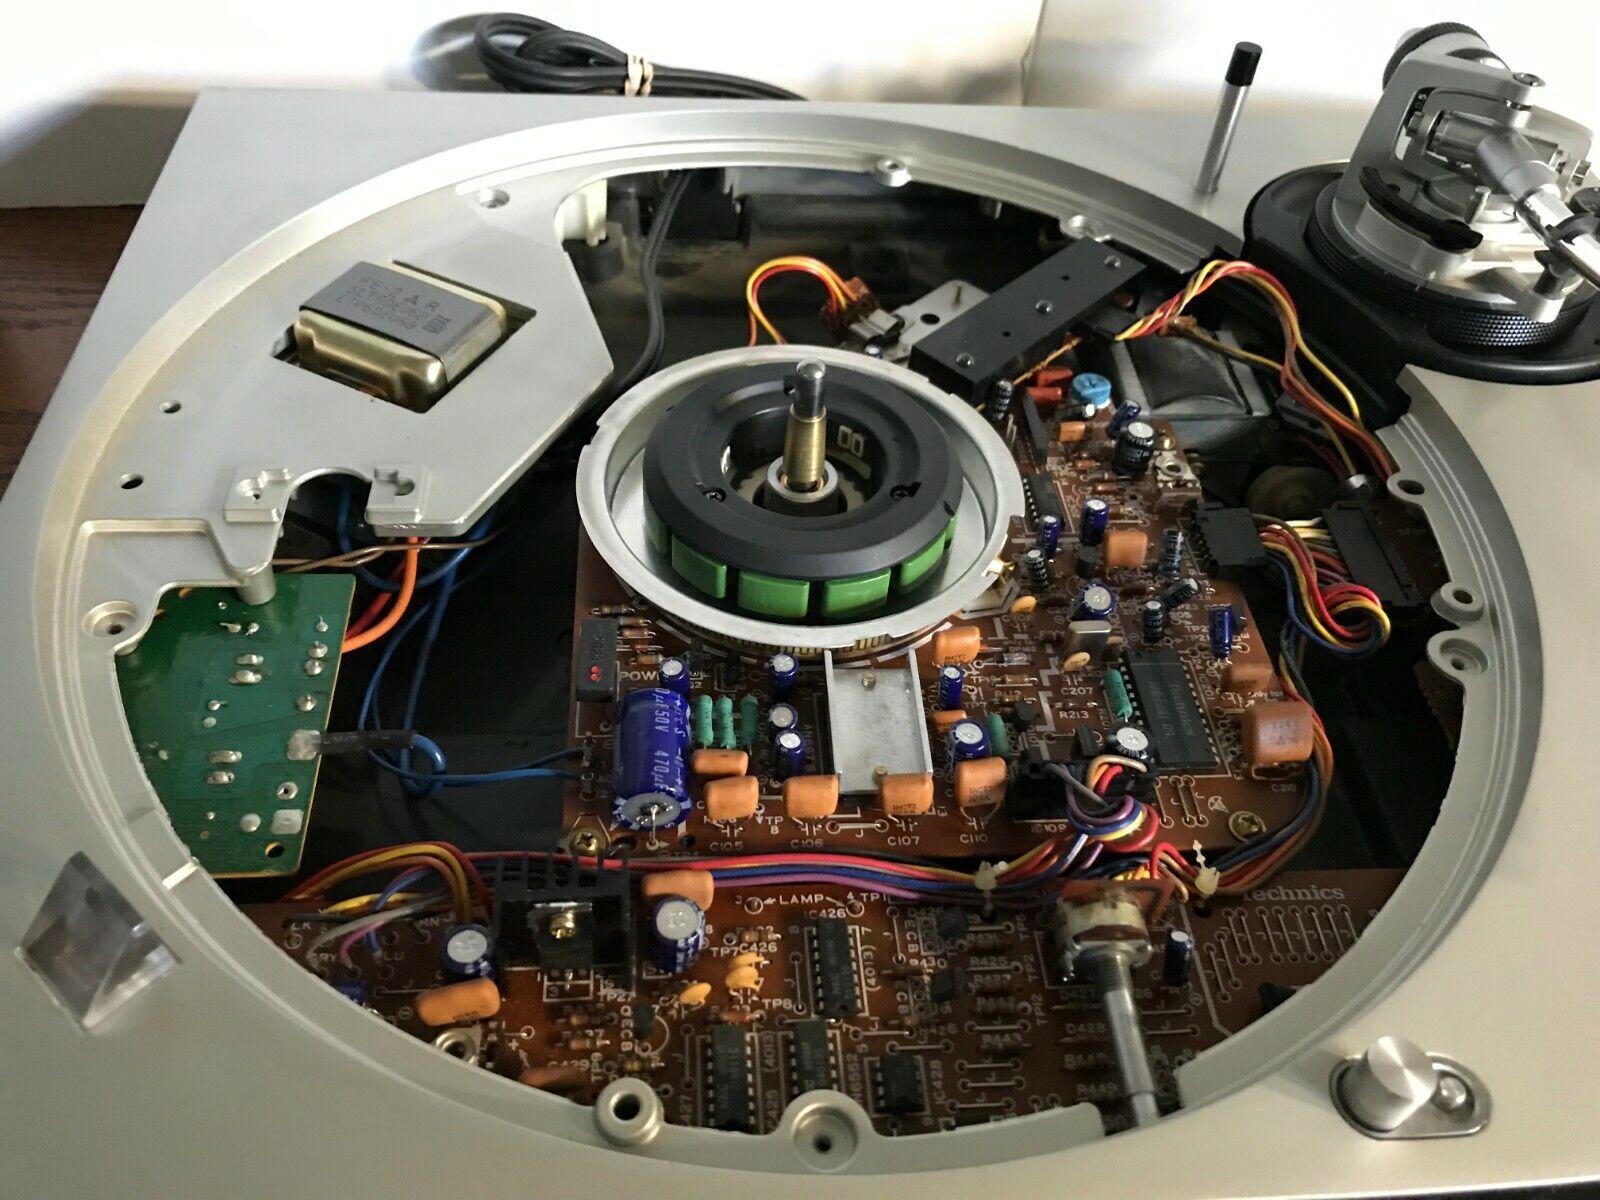 Technics SL 1600 1610 1700 MK2 Auto Turntable Replacement Cue Belt SFGB172-51